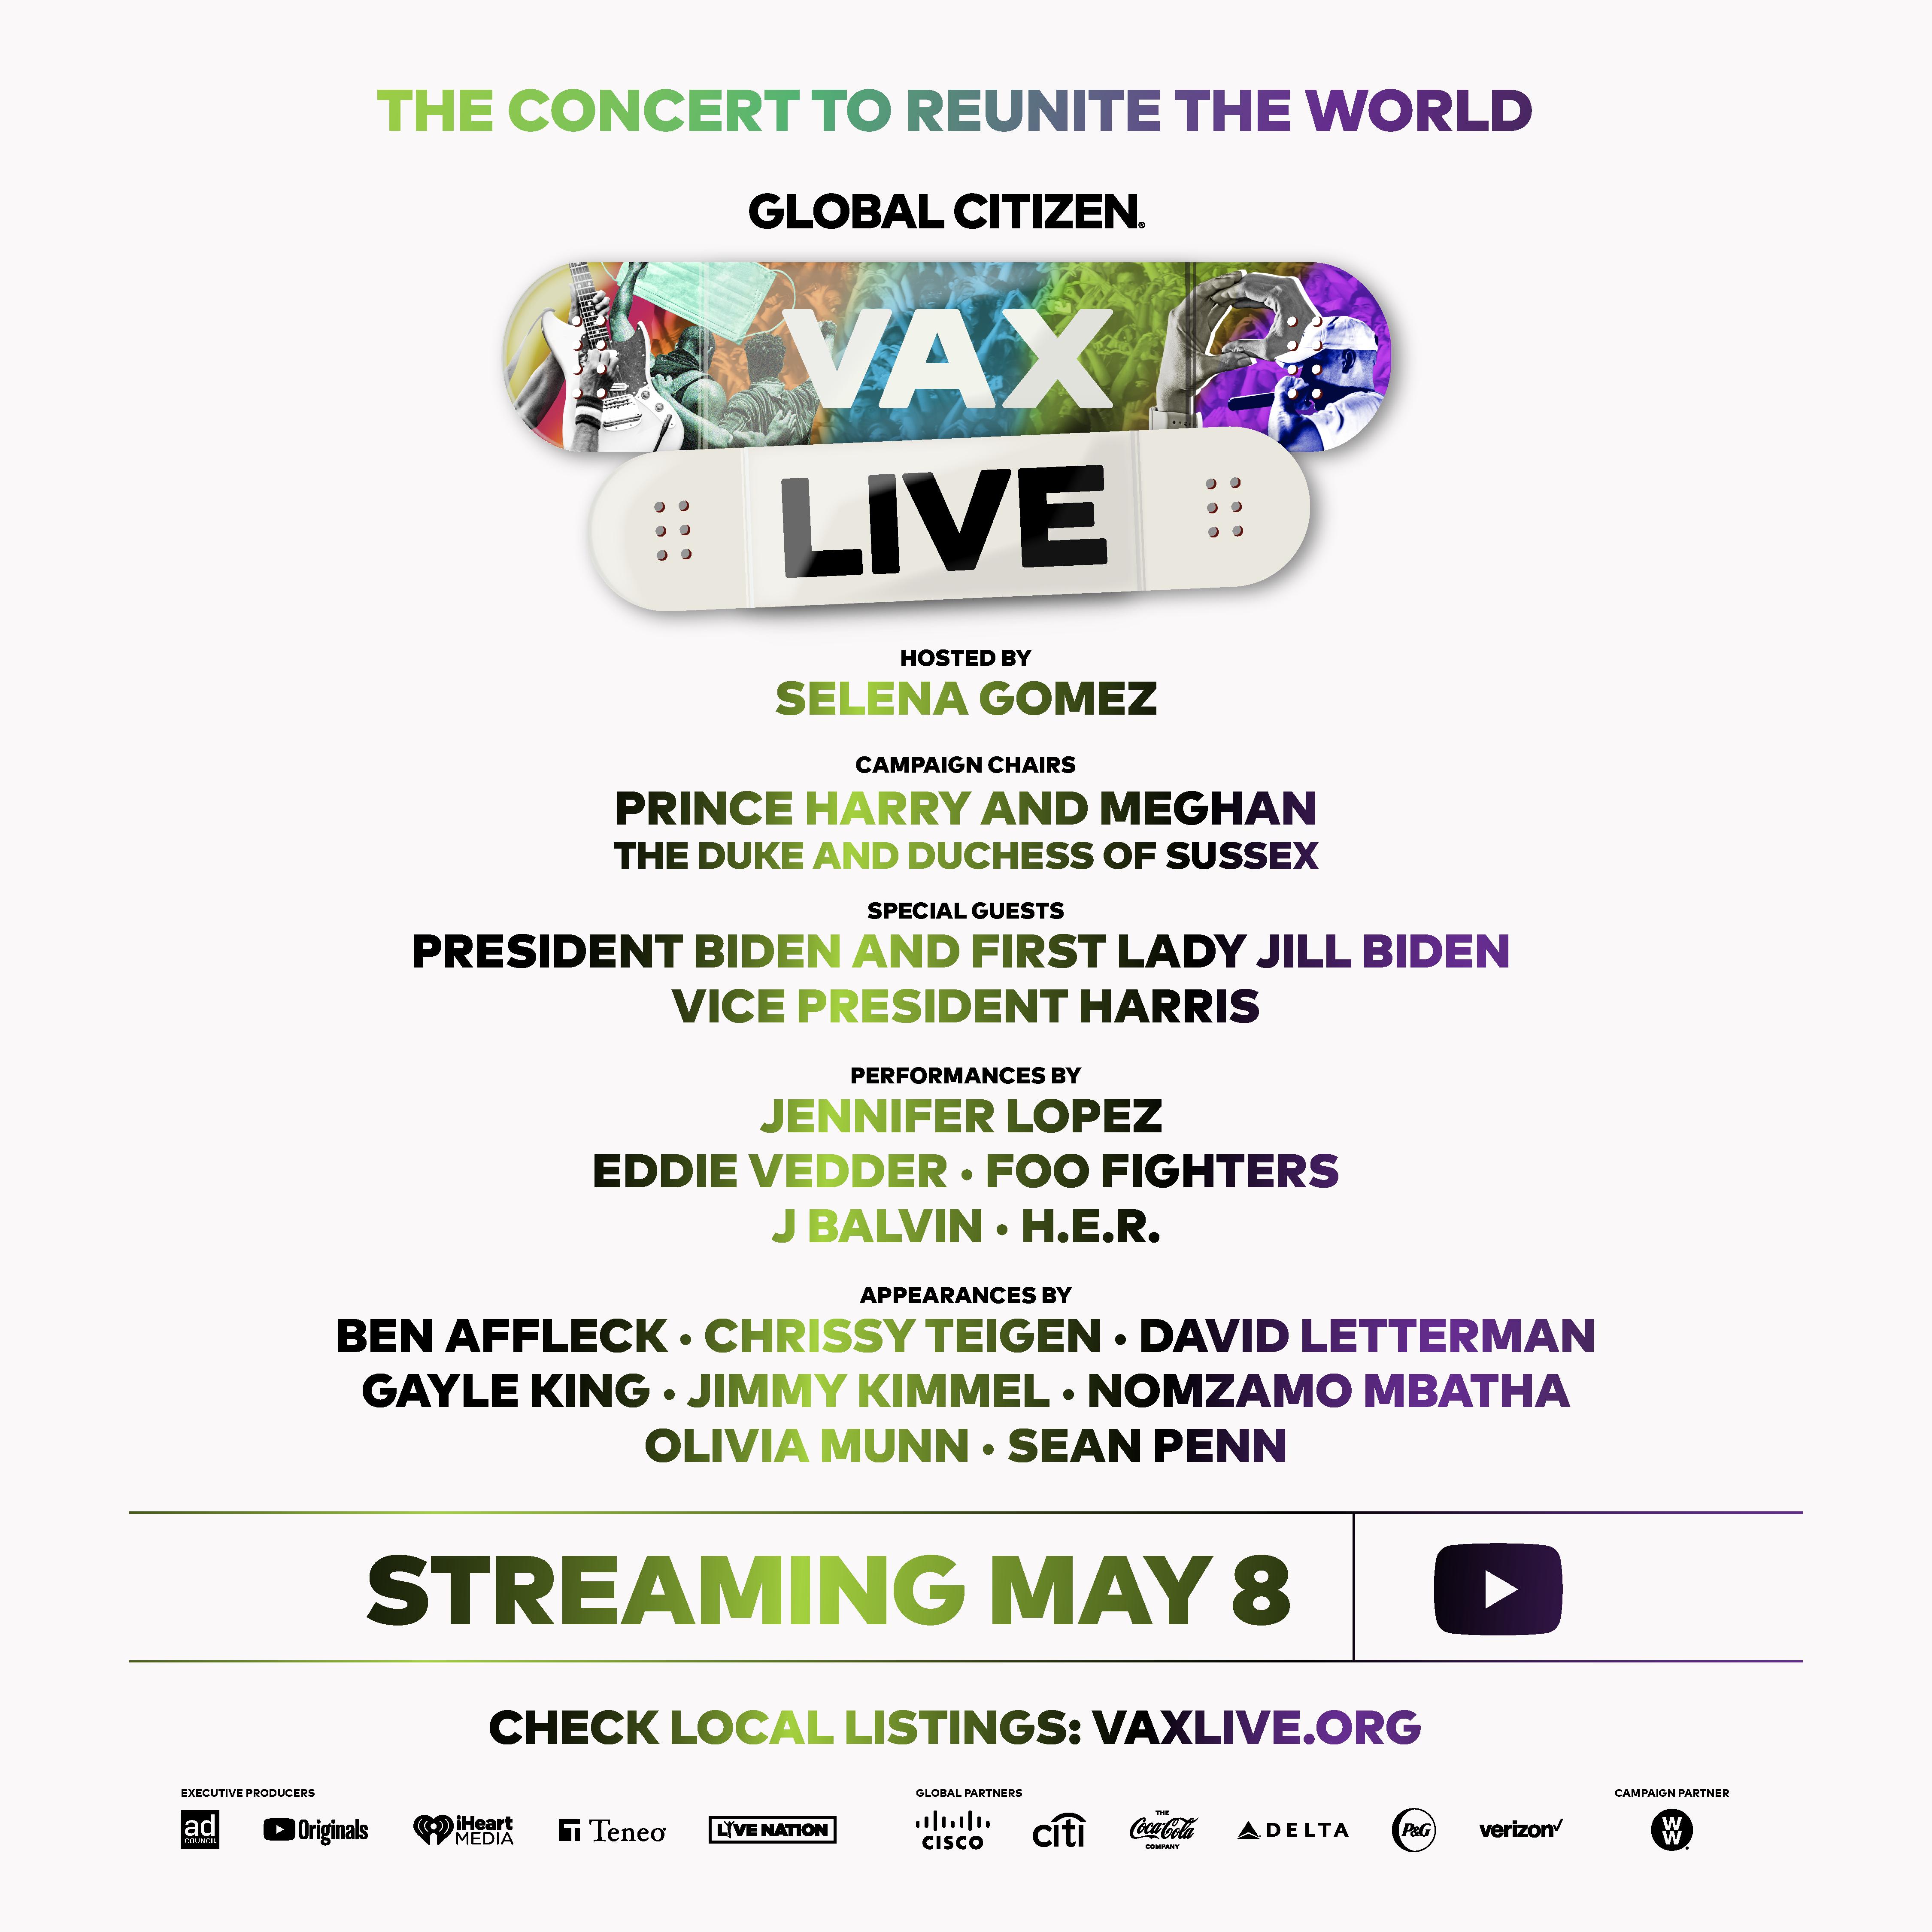 VAX LIVE Admat FINAL - May 8